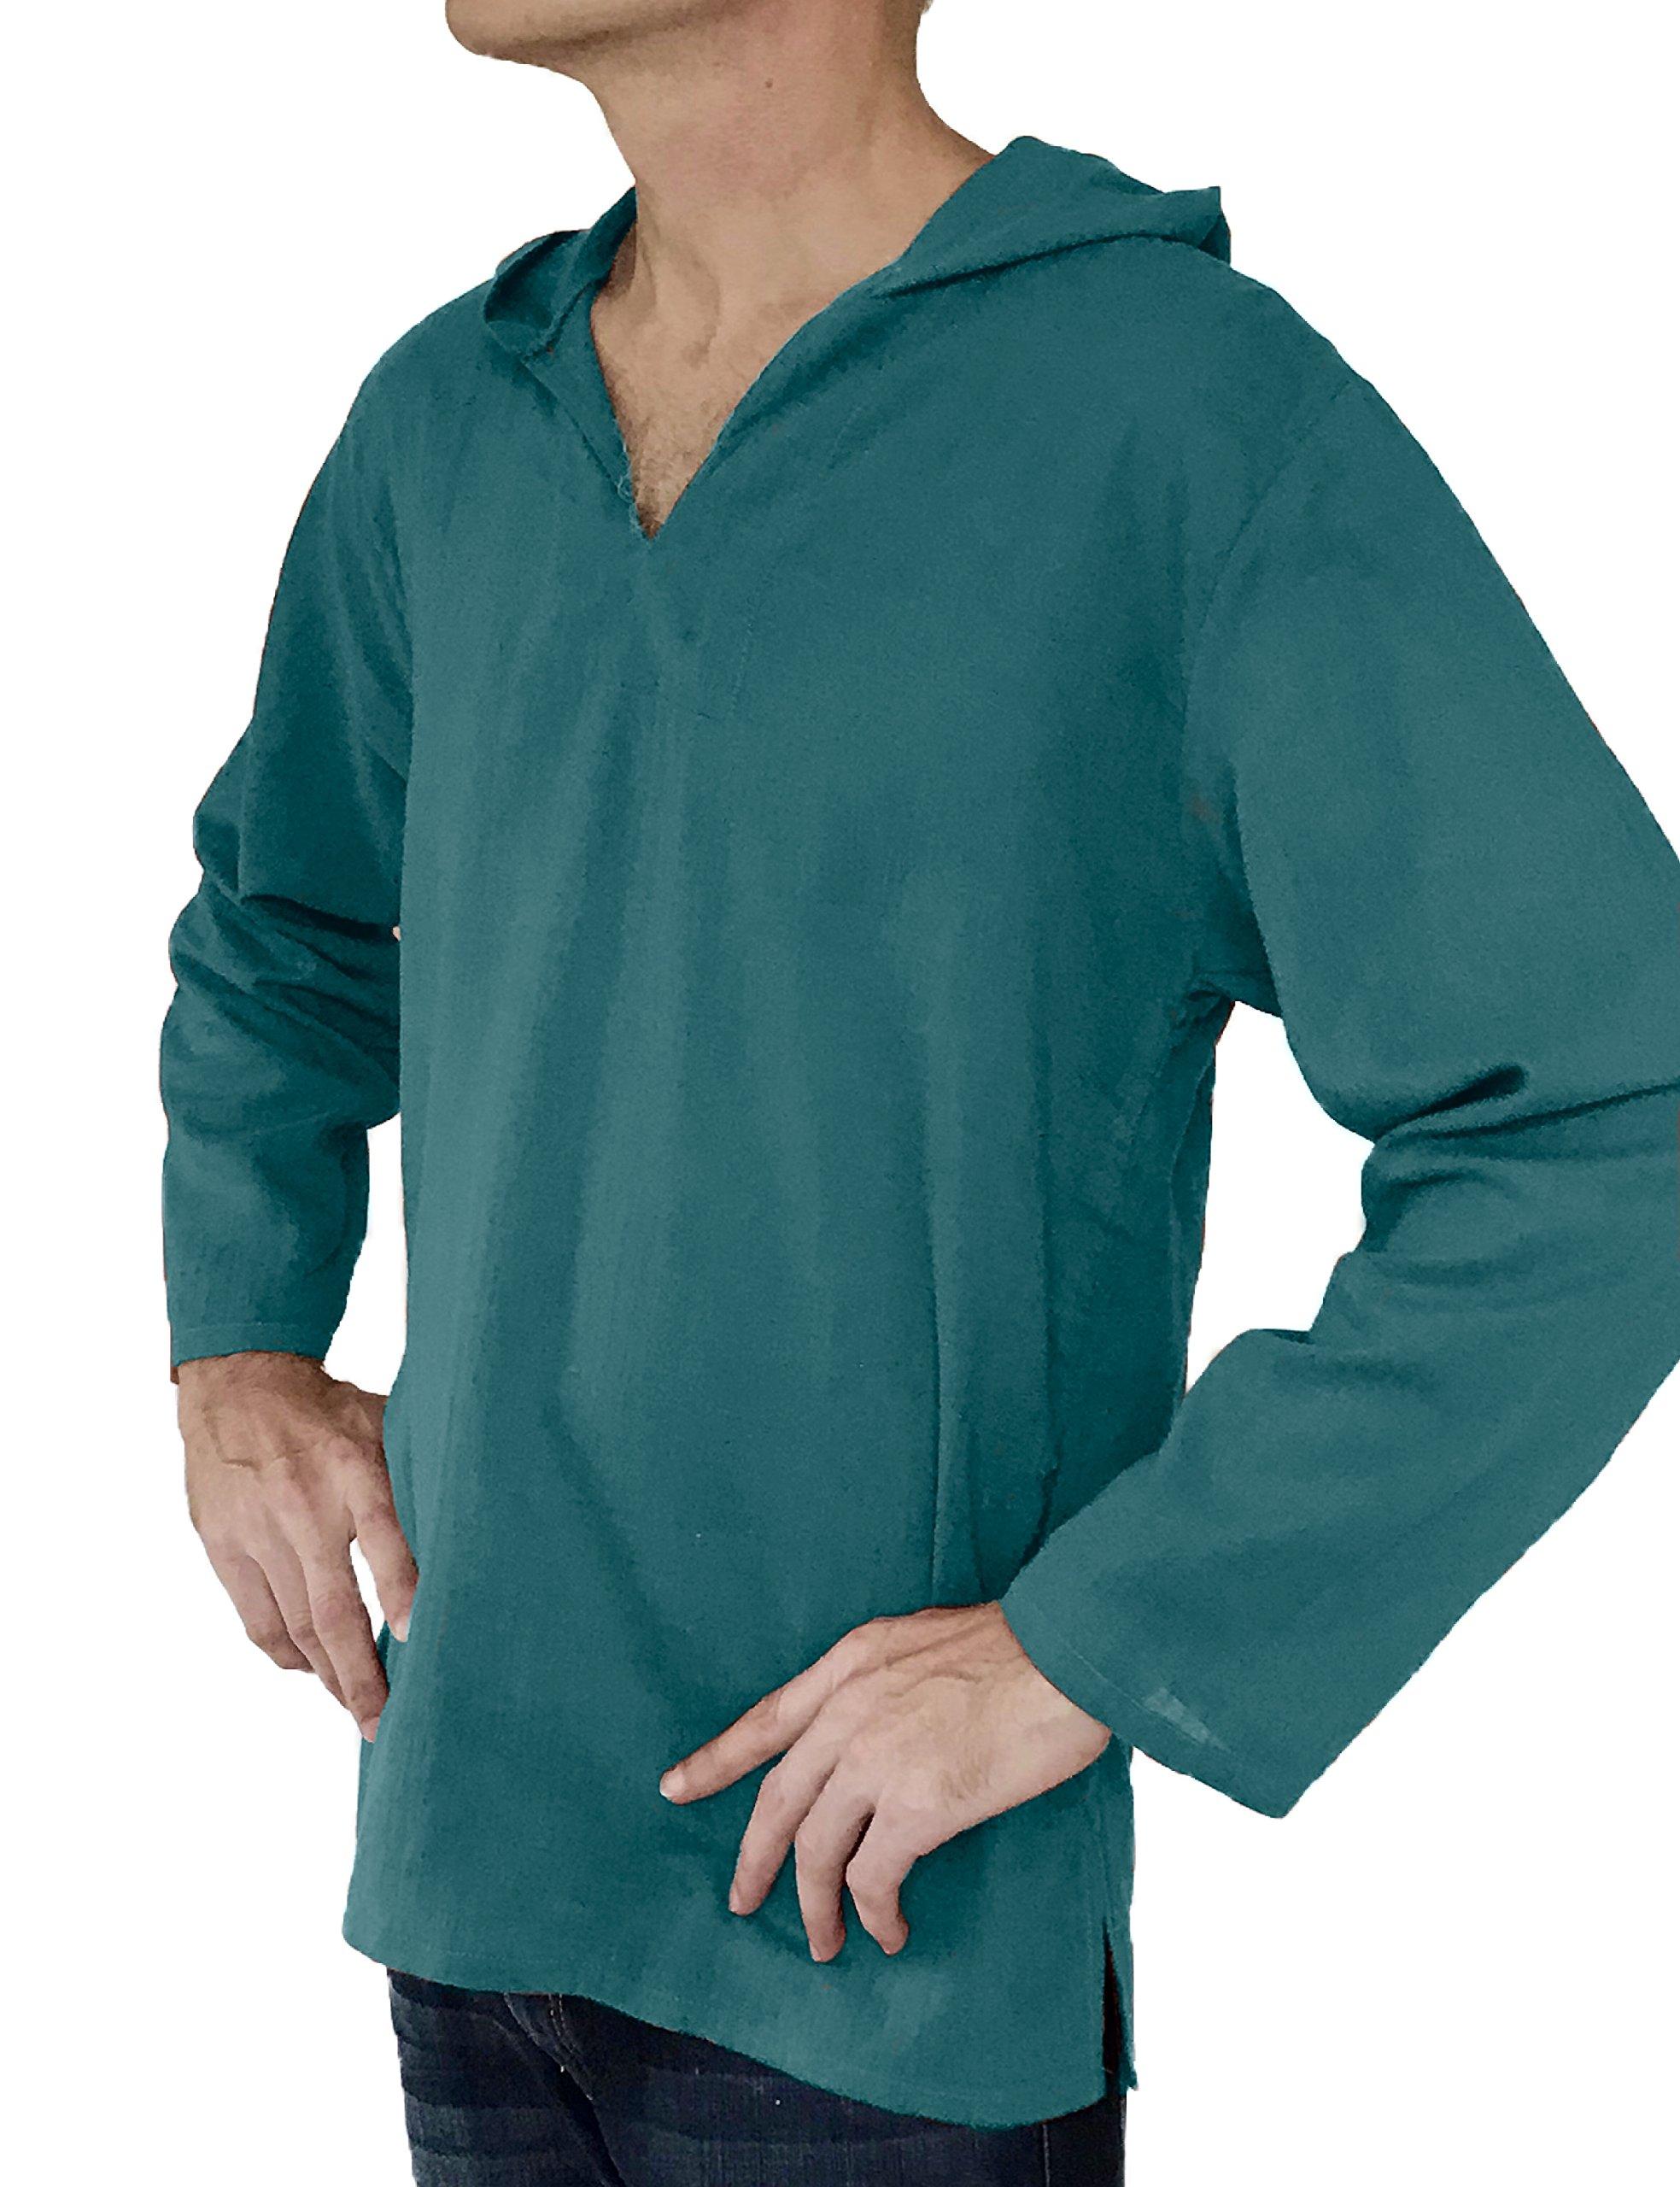 Love Quality Men's Hoodie Hippie Shirts Beach 100% Soft Cotton Top Yoga Shirt Boho (XX-Large, Teal)